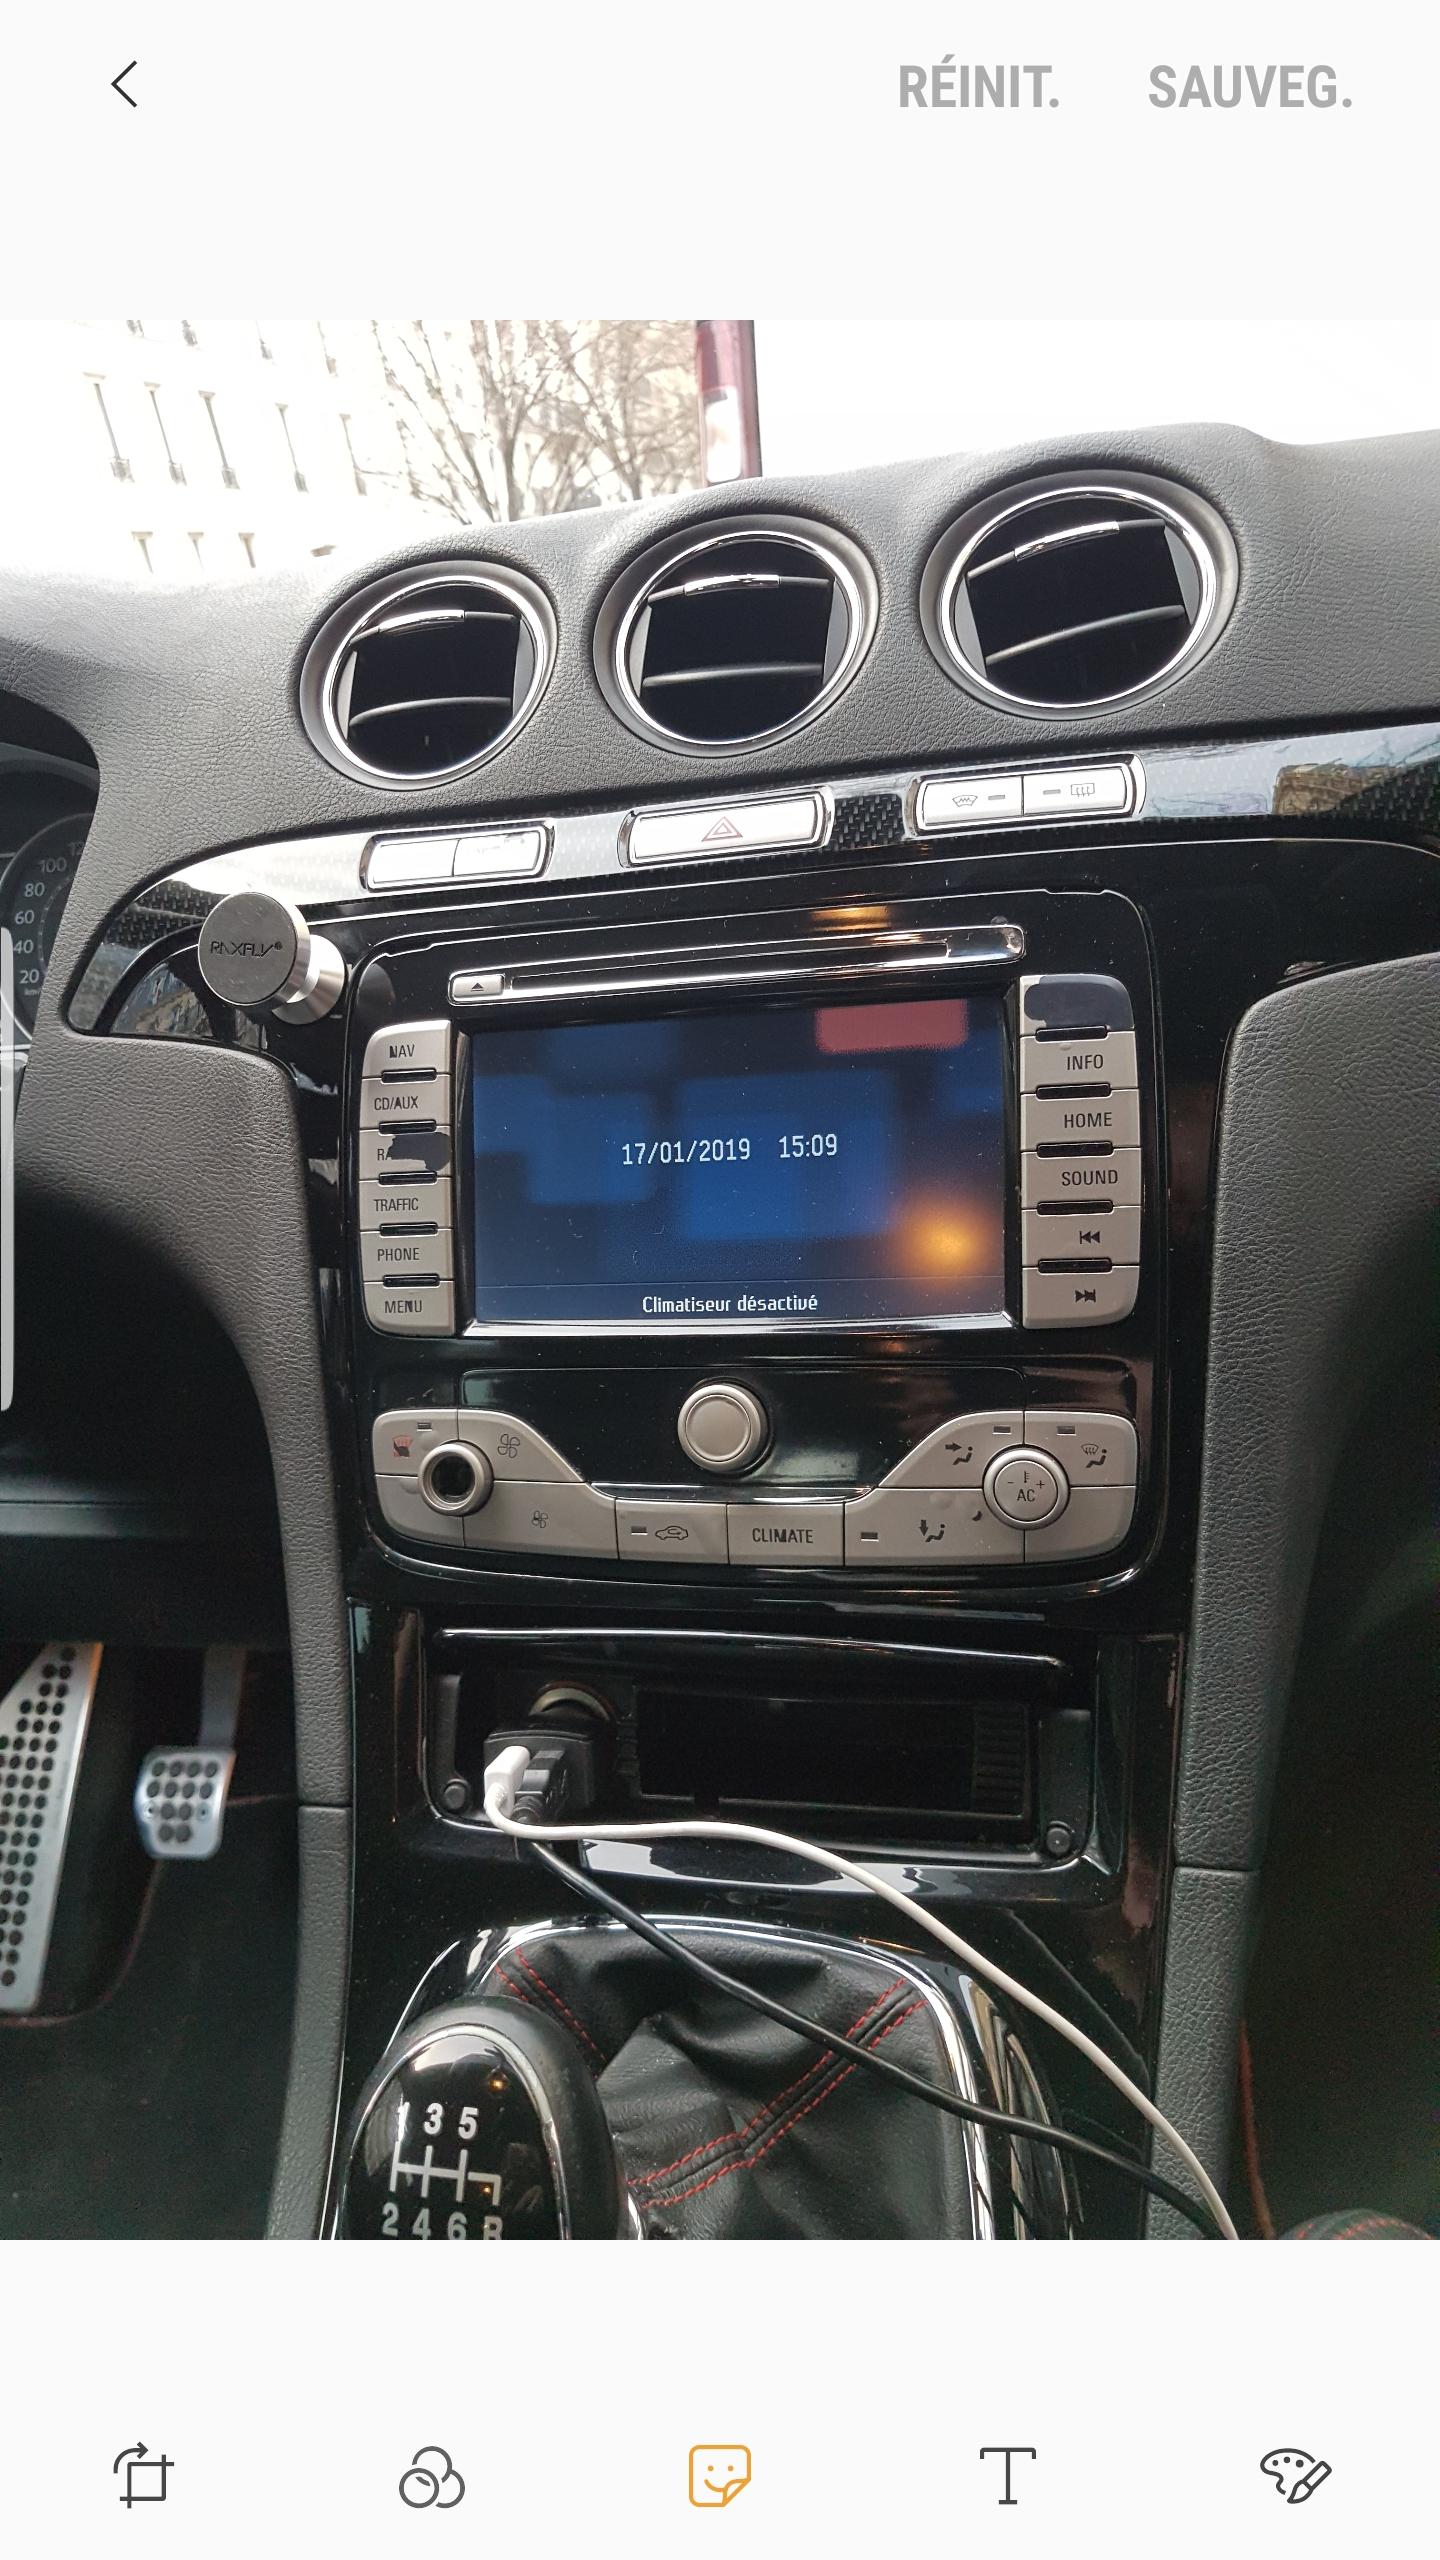 Projet de remplacement d'autoradio  1549229356-screenshot-20190116-155527-photo-editor